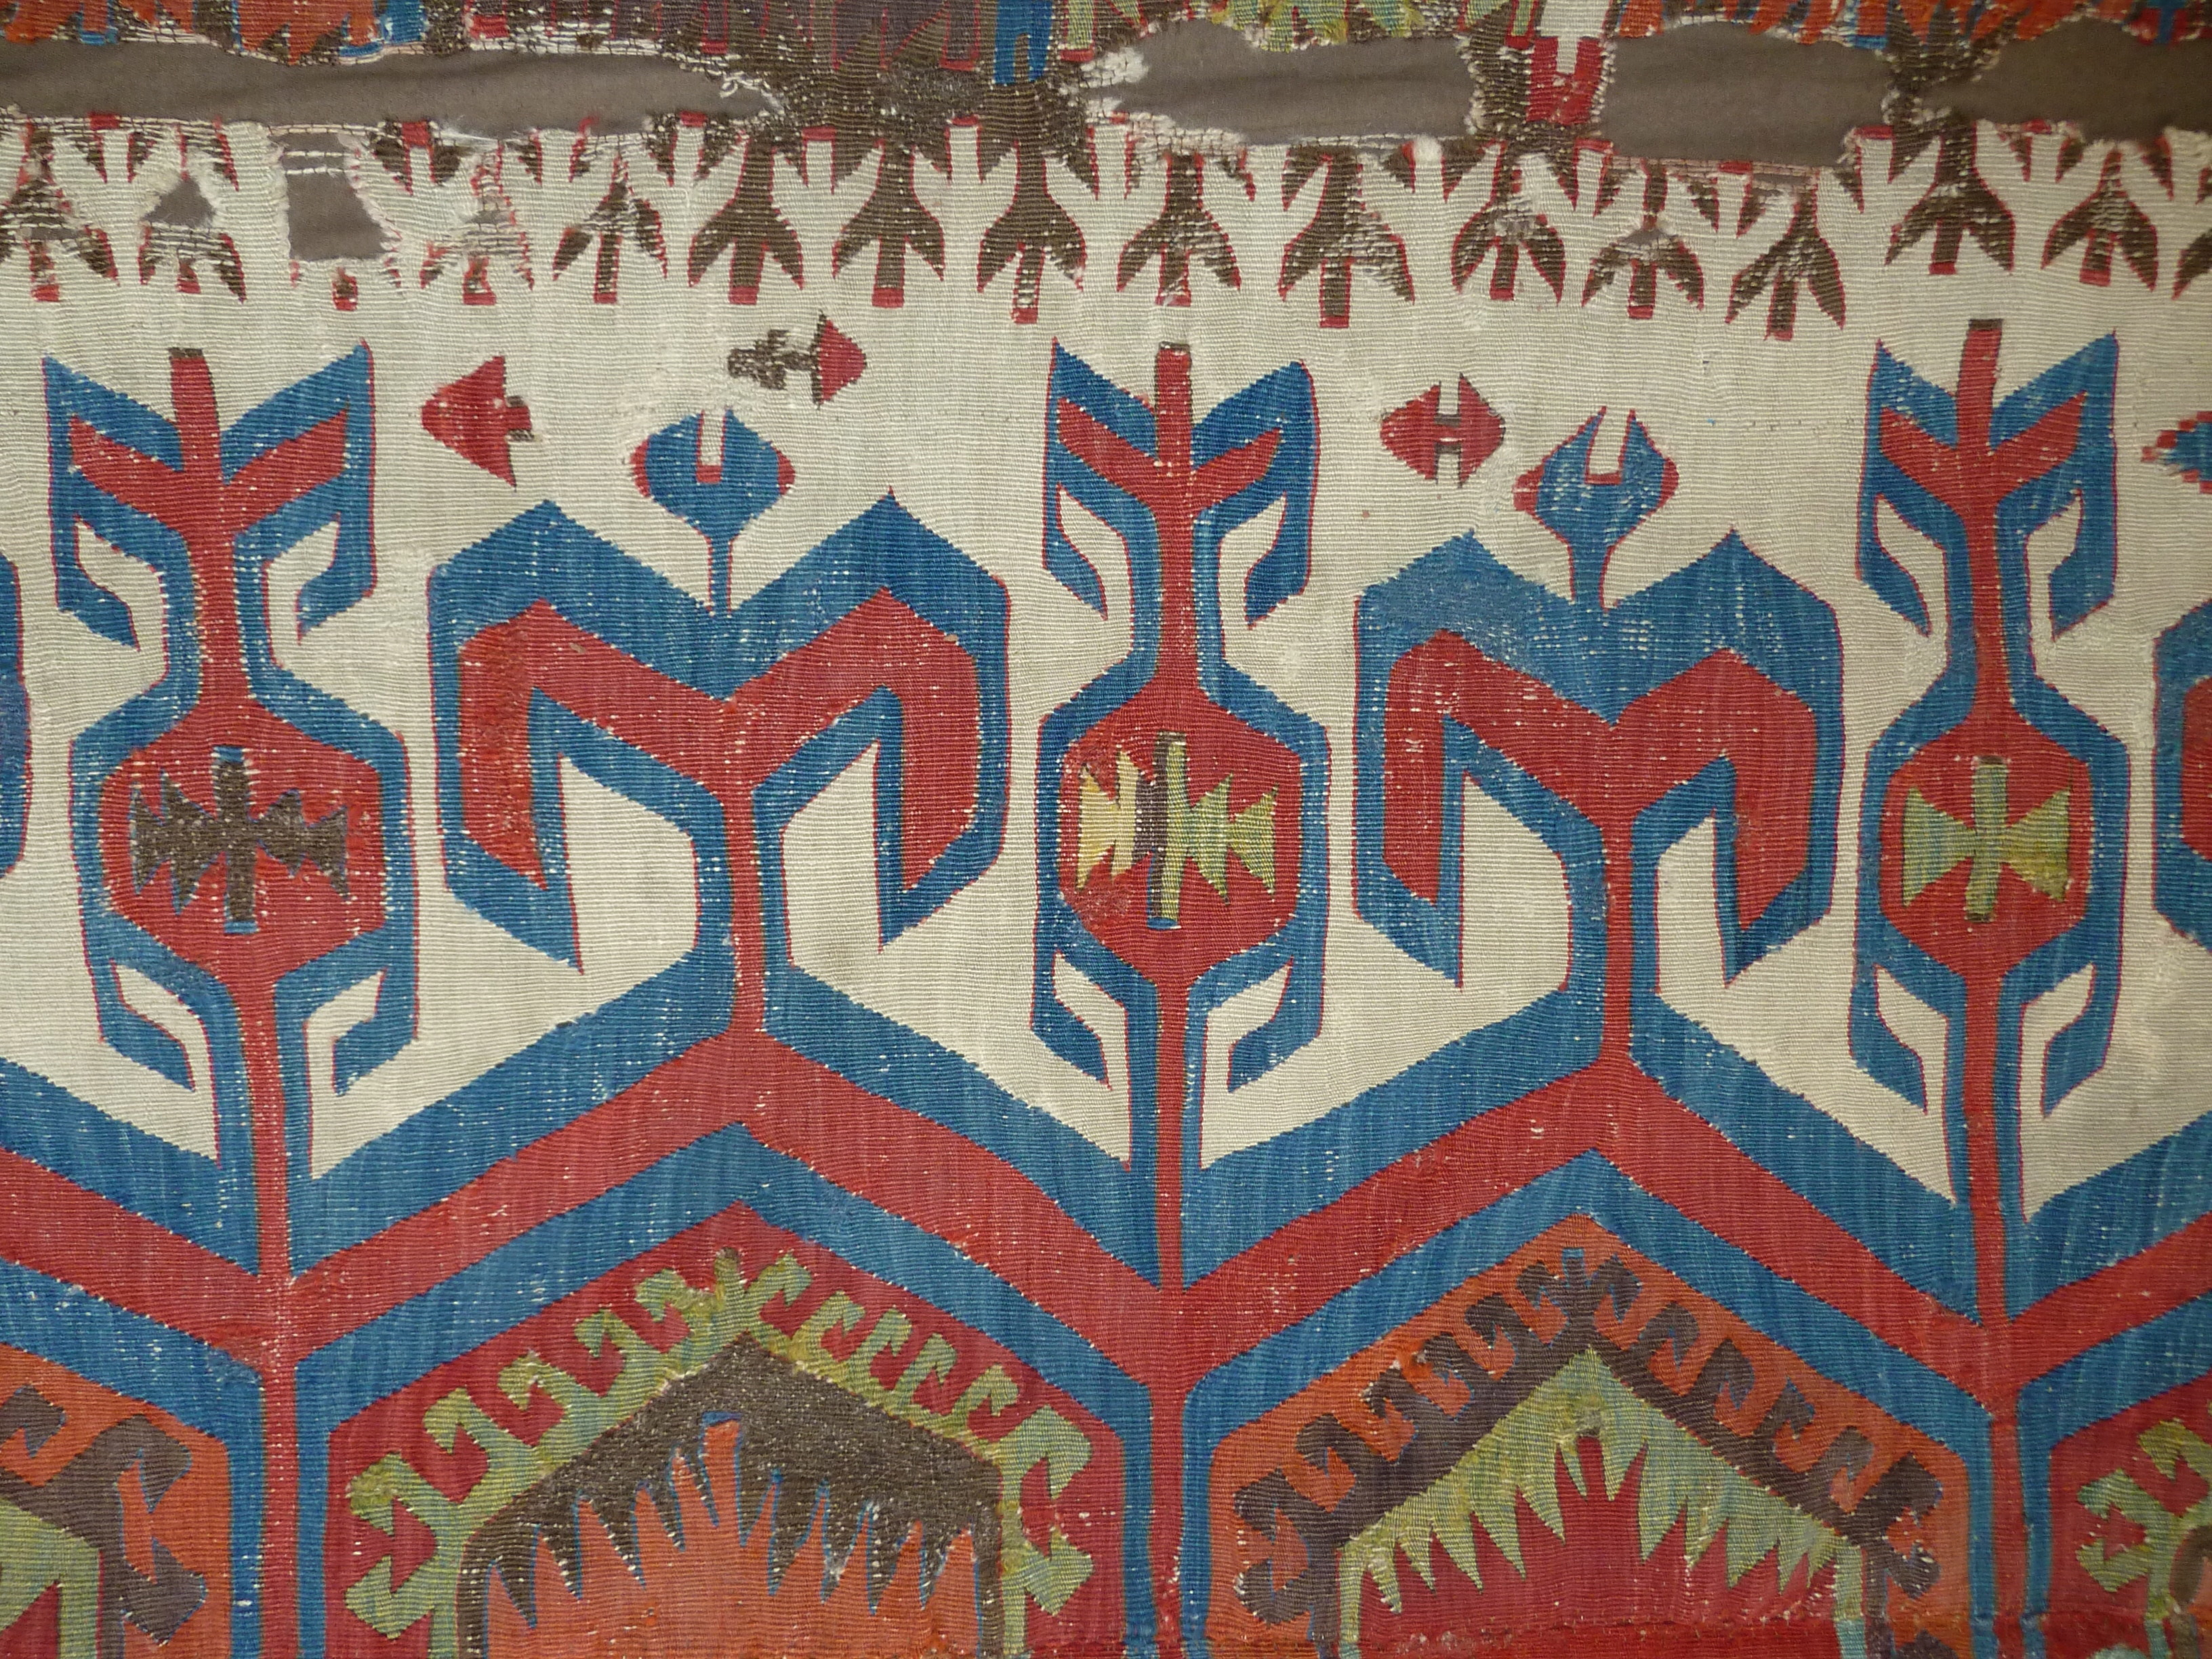 Central Anatolian kilim (detail), before 1800. Markus Voigt, London